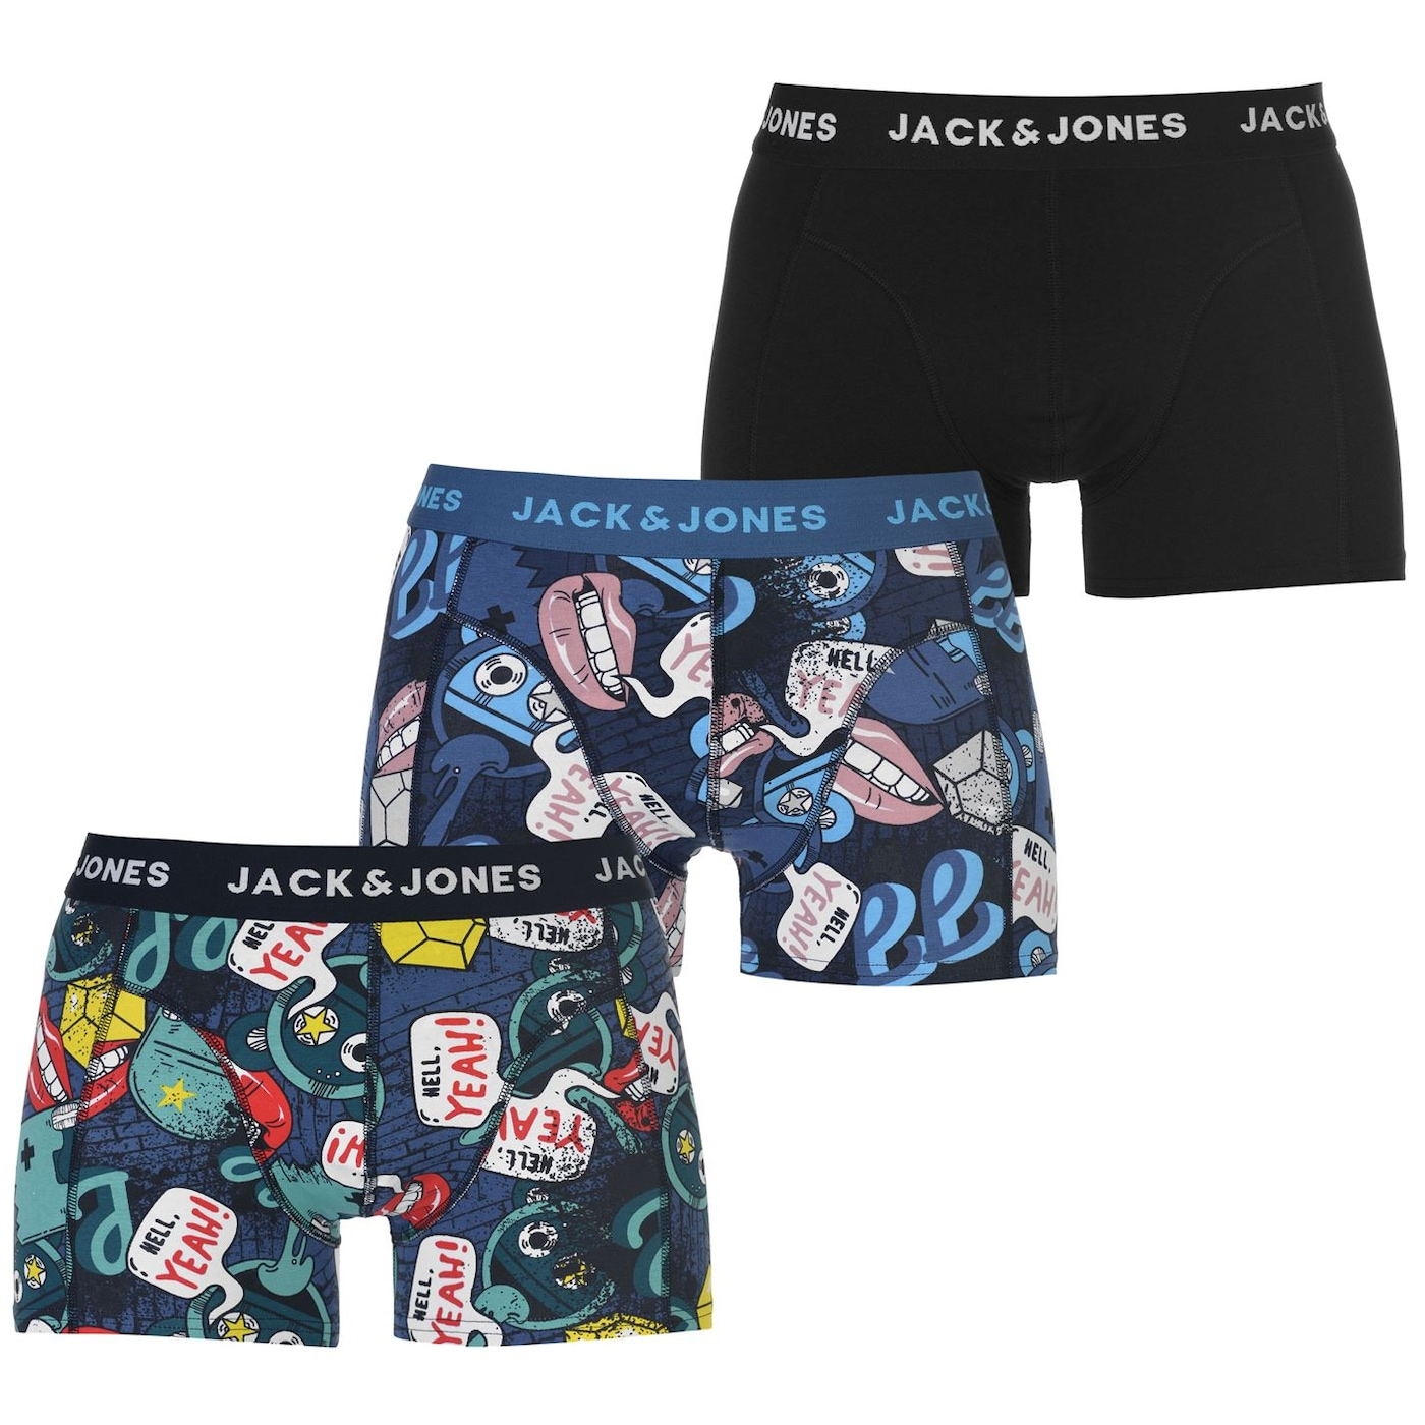 Jack and Jones 3 Pack Printed Trunks